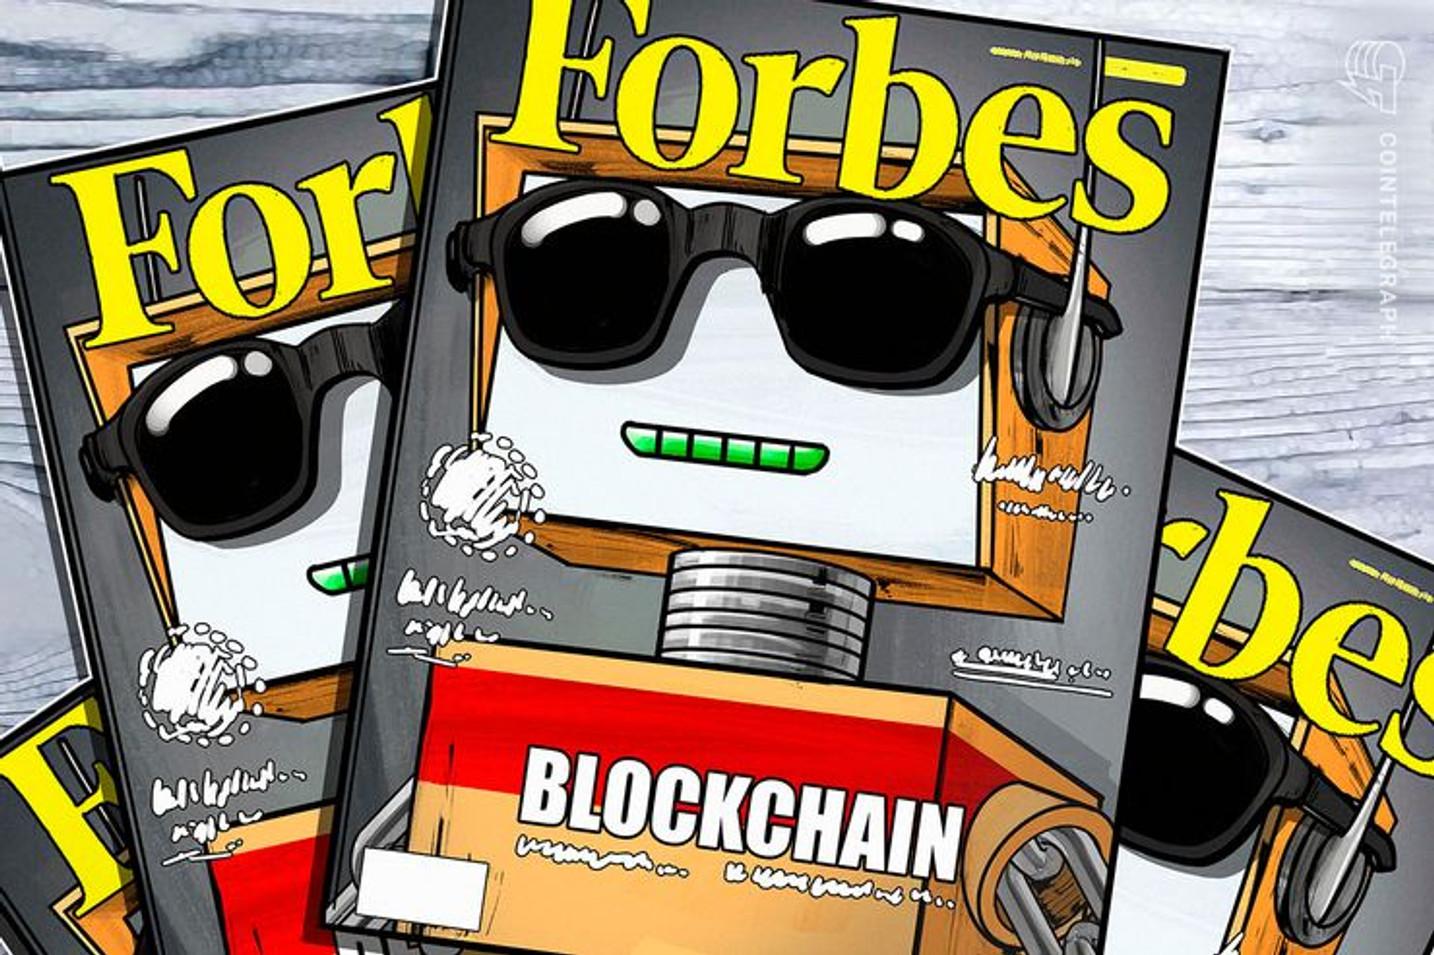 Forbes Brasil lista startups promissoras em 2019 e cita empresas cripto e blockchain